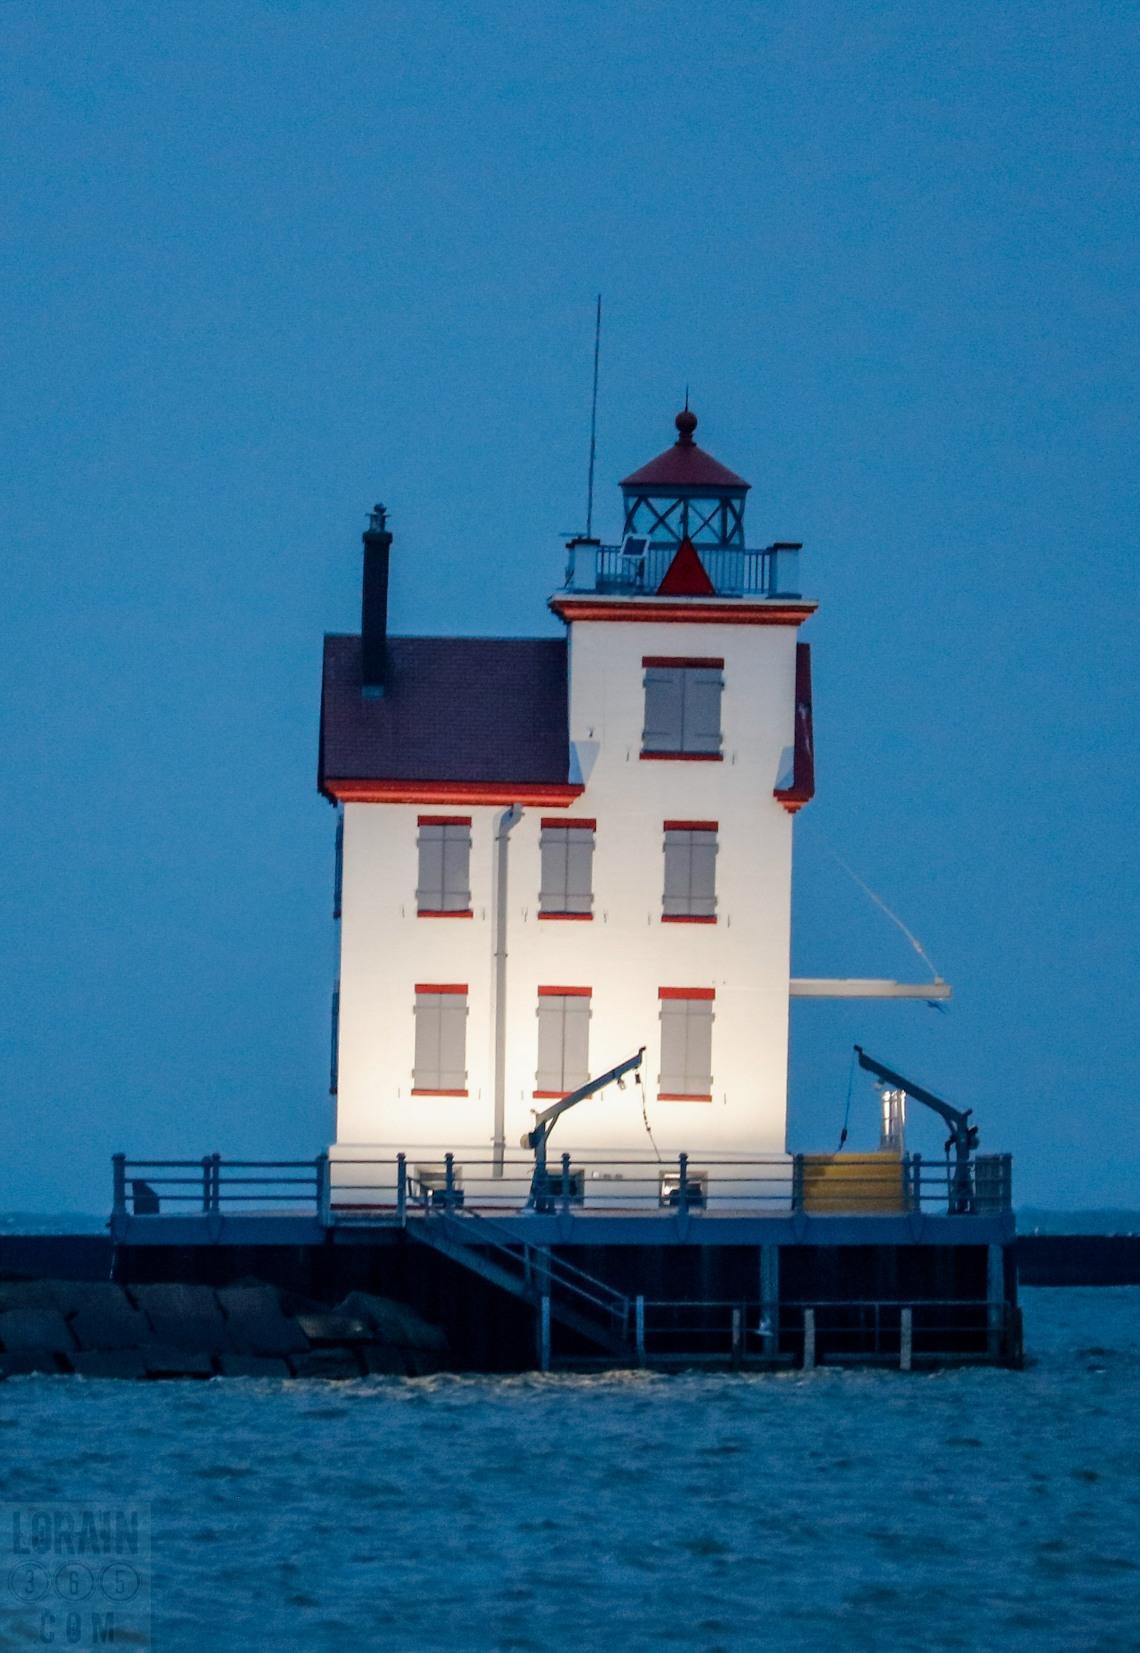 Lorain Lighthouse 042616